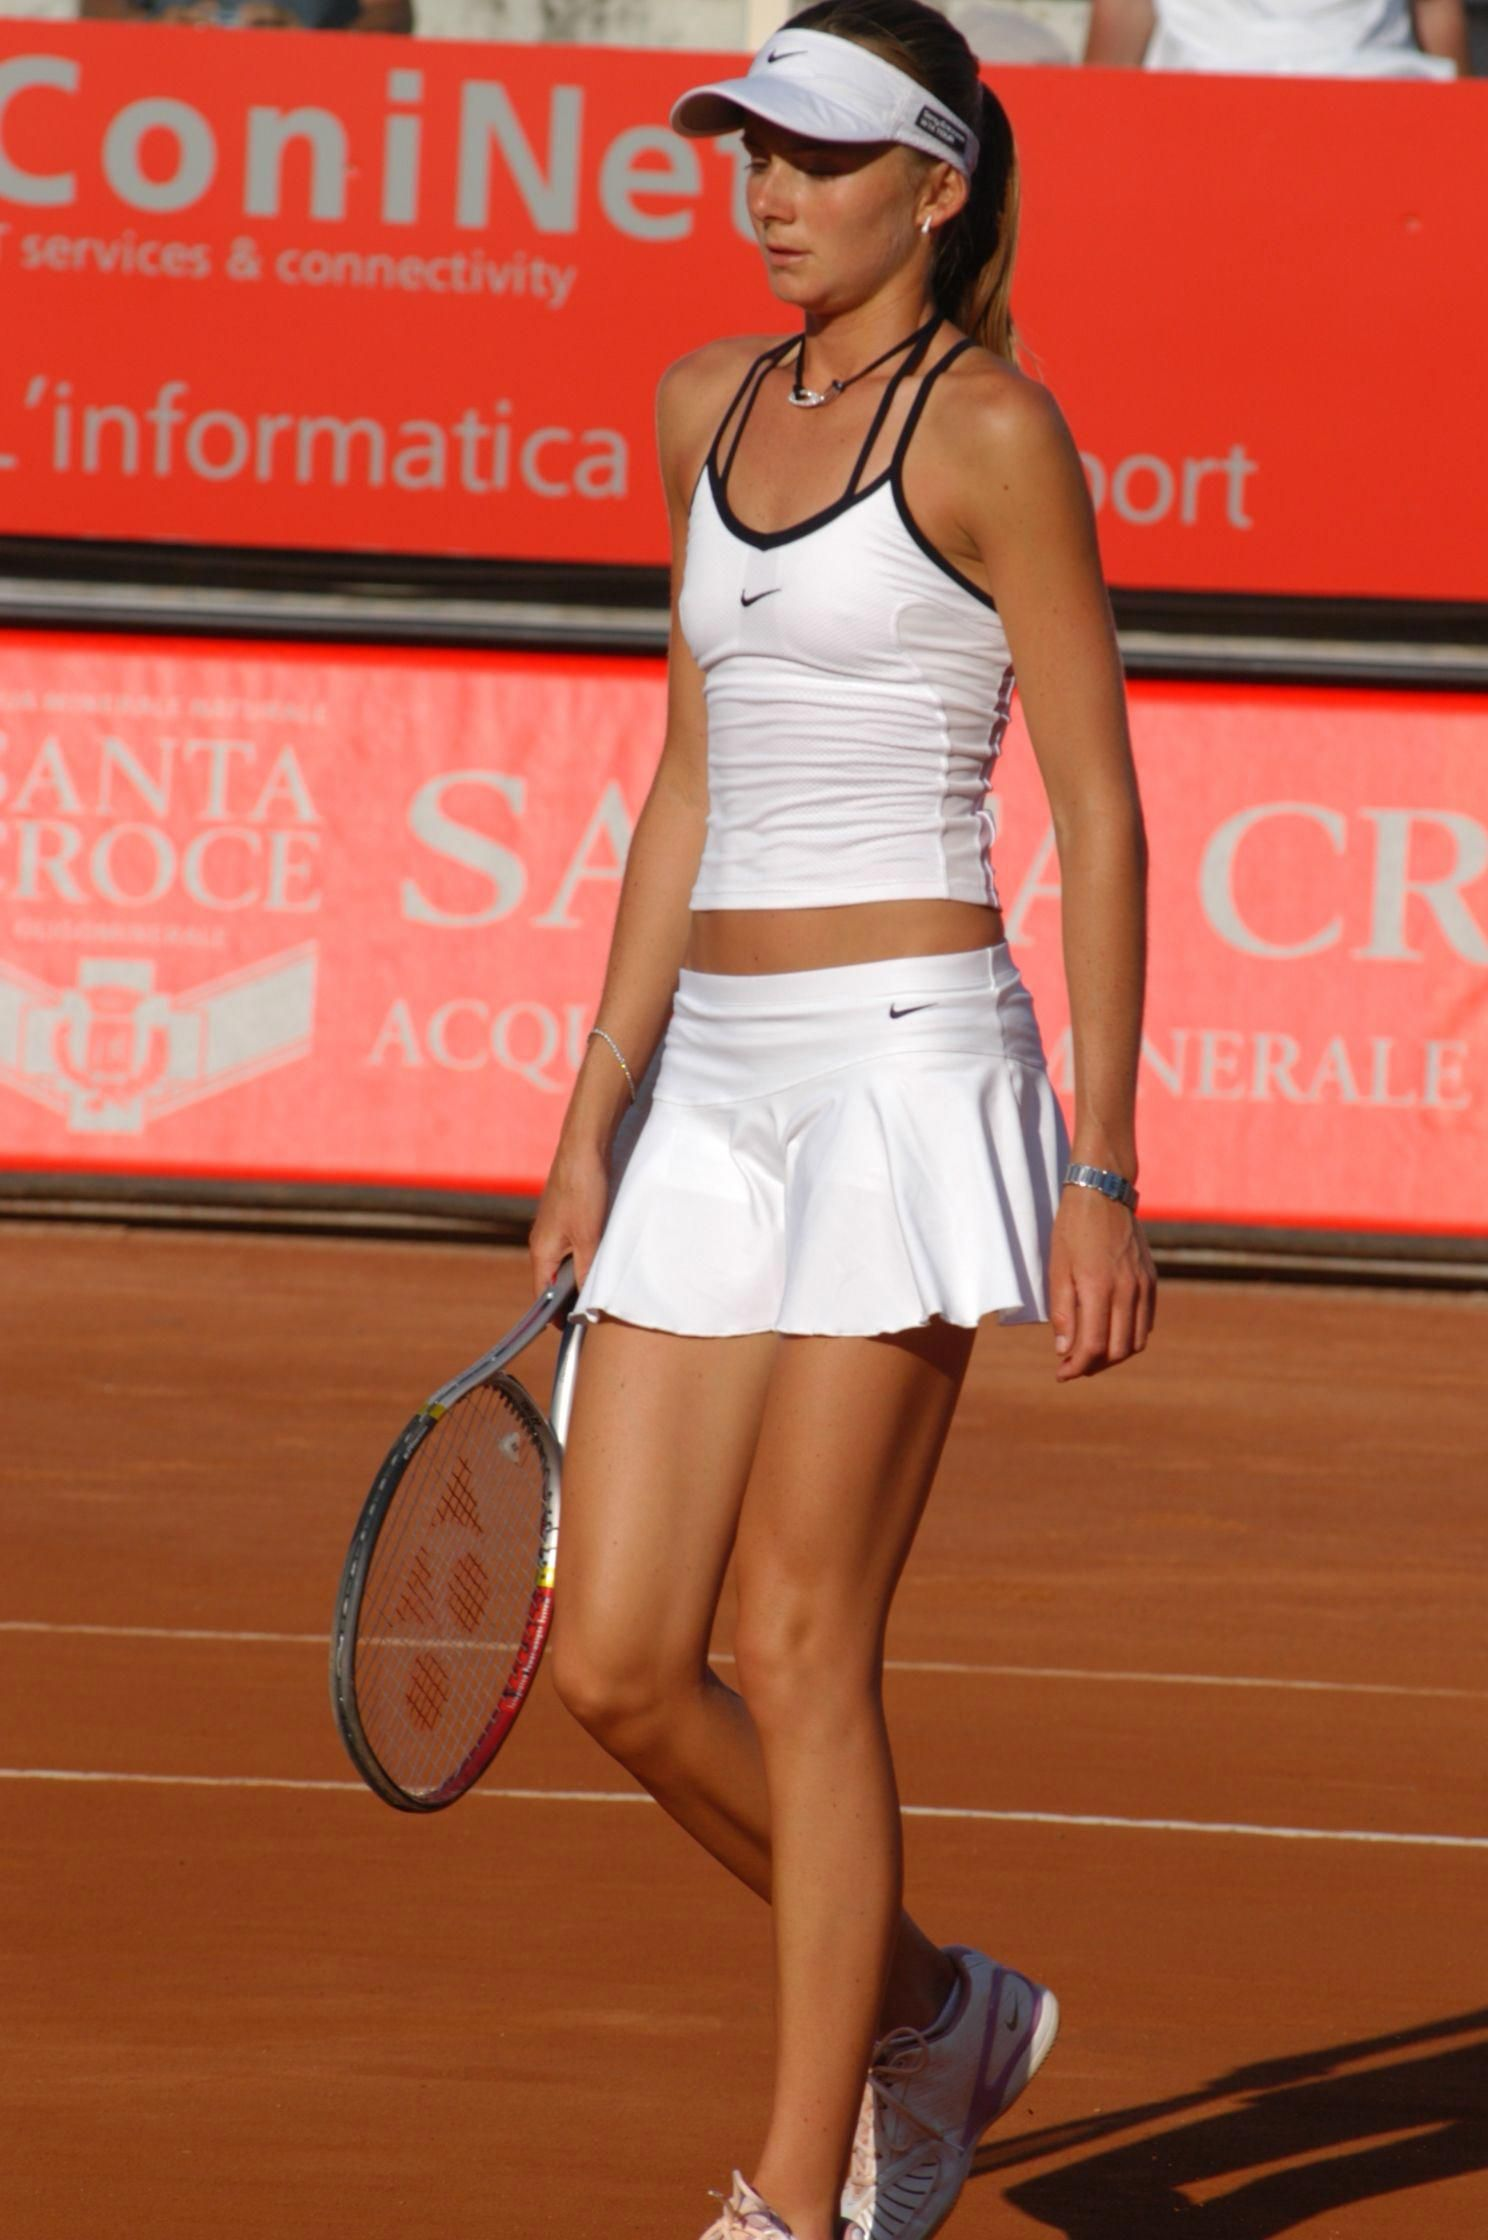 Daniela Hantuchova Playing The Sport She Loves Tennis Wta Hantuchova Tennisoutfit Tennis Outfit Women Tennis Players Female Tennis Clothes